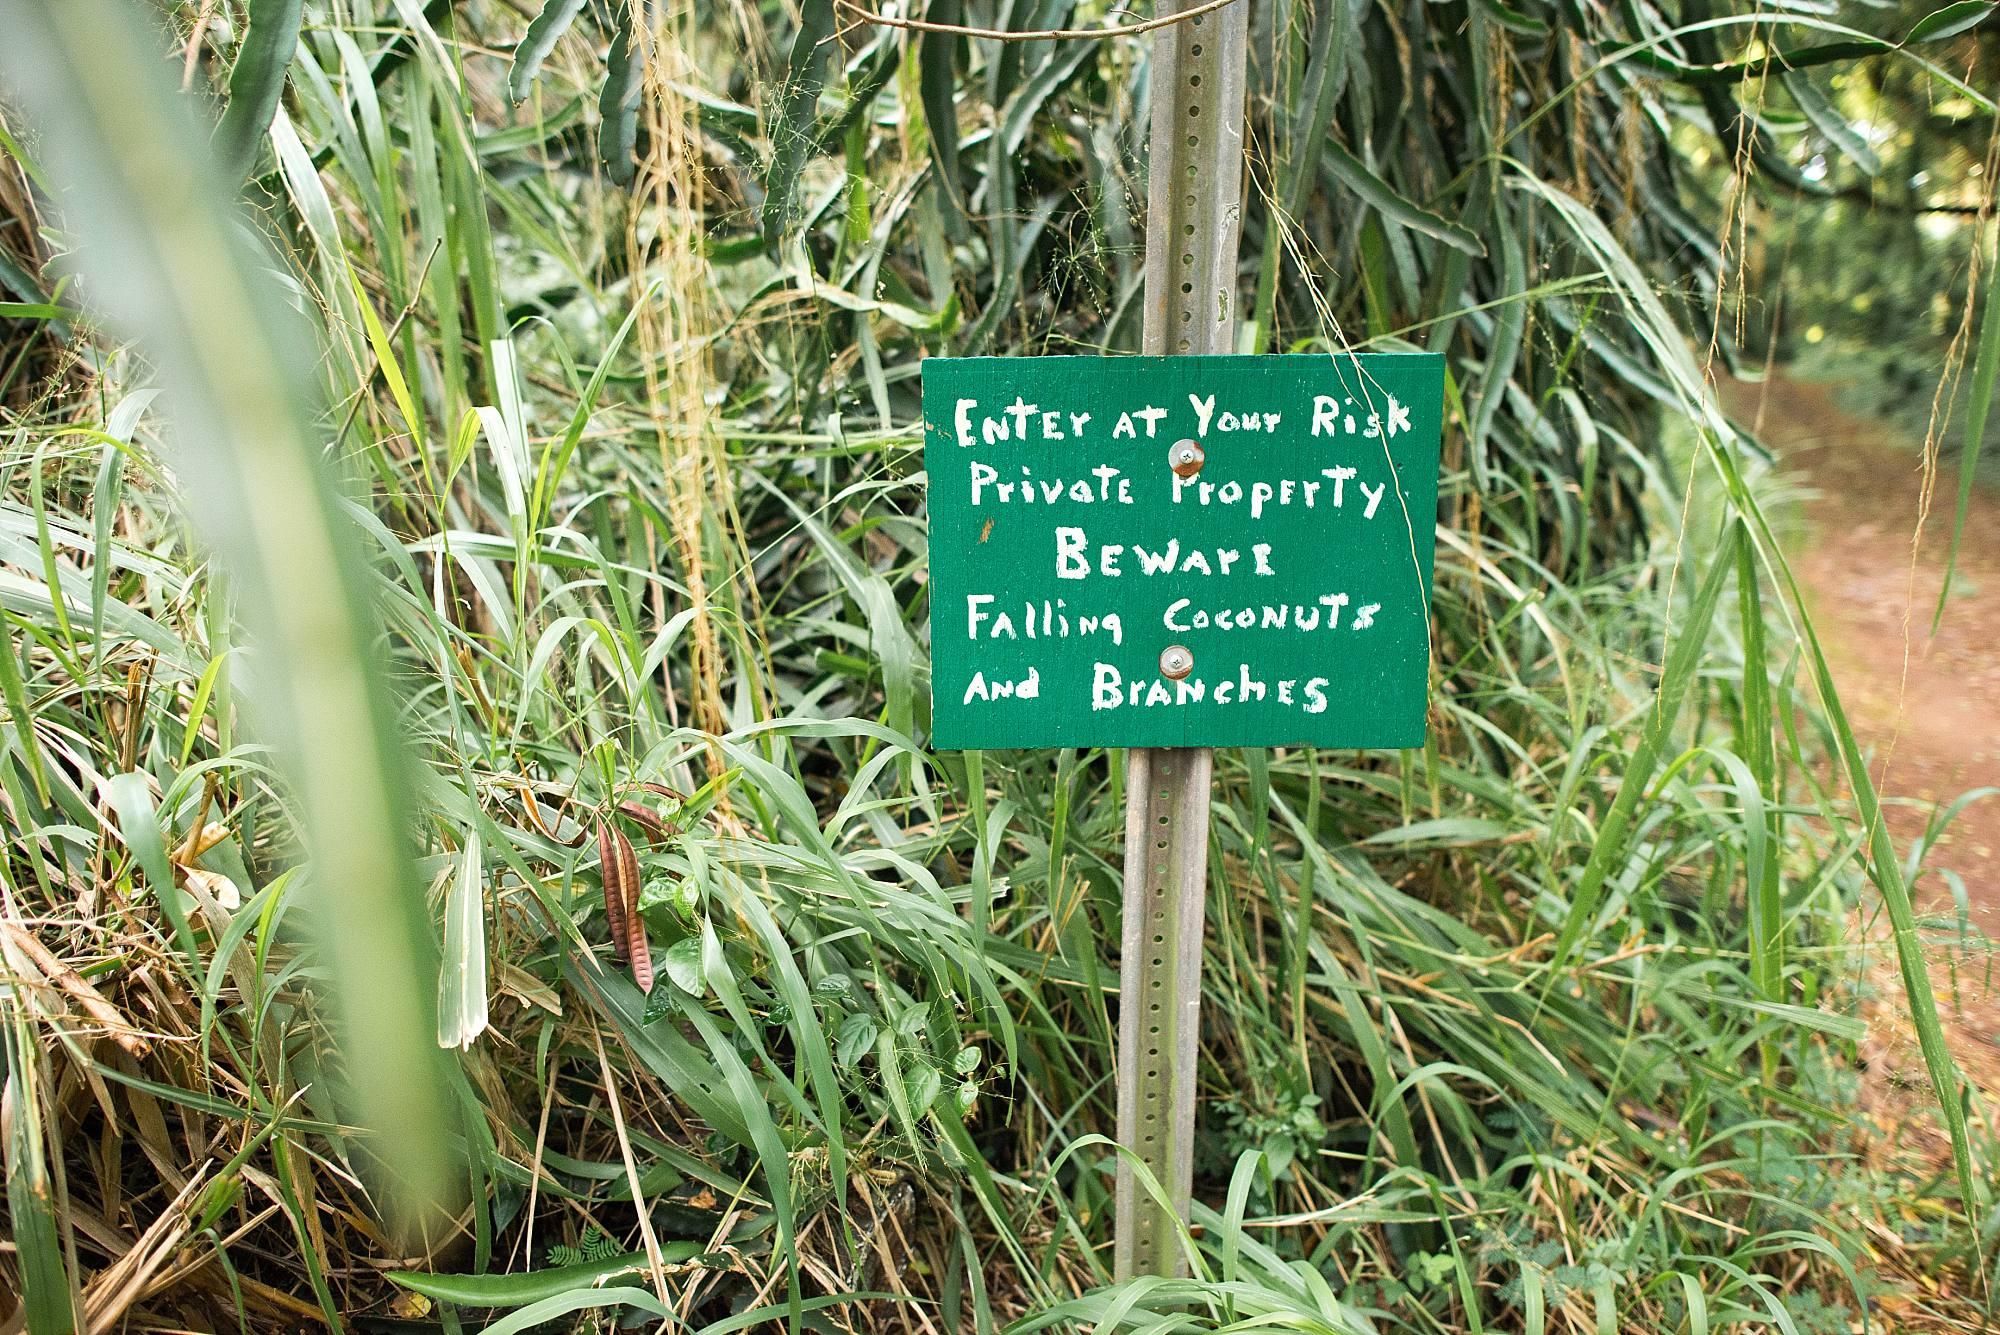 Jungle sign beware of falling coconuts